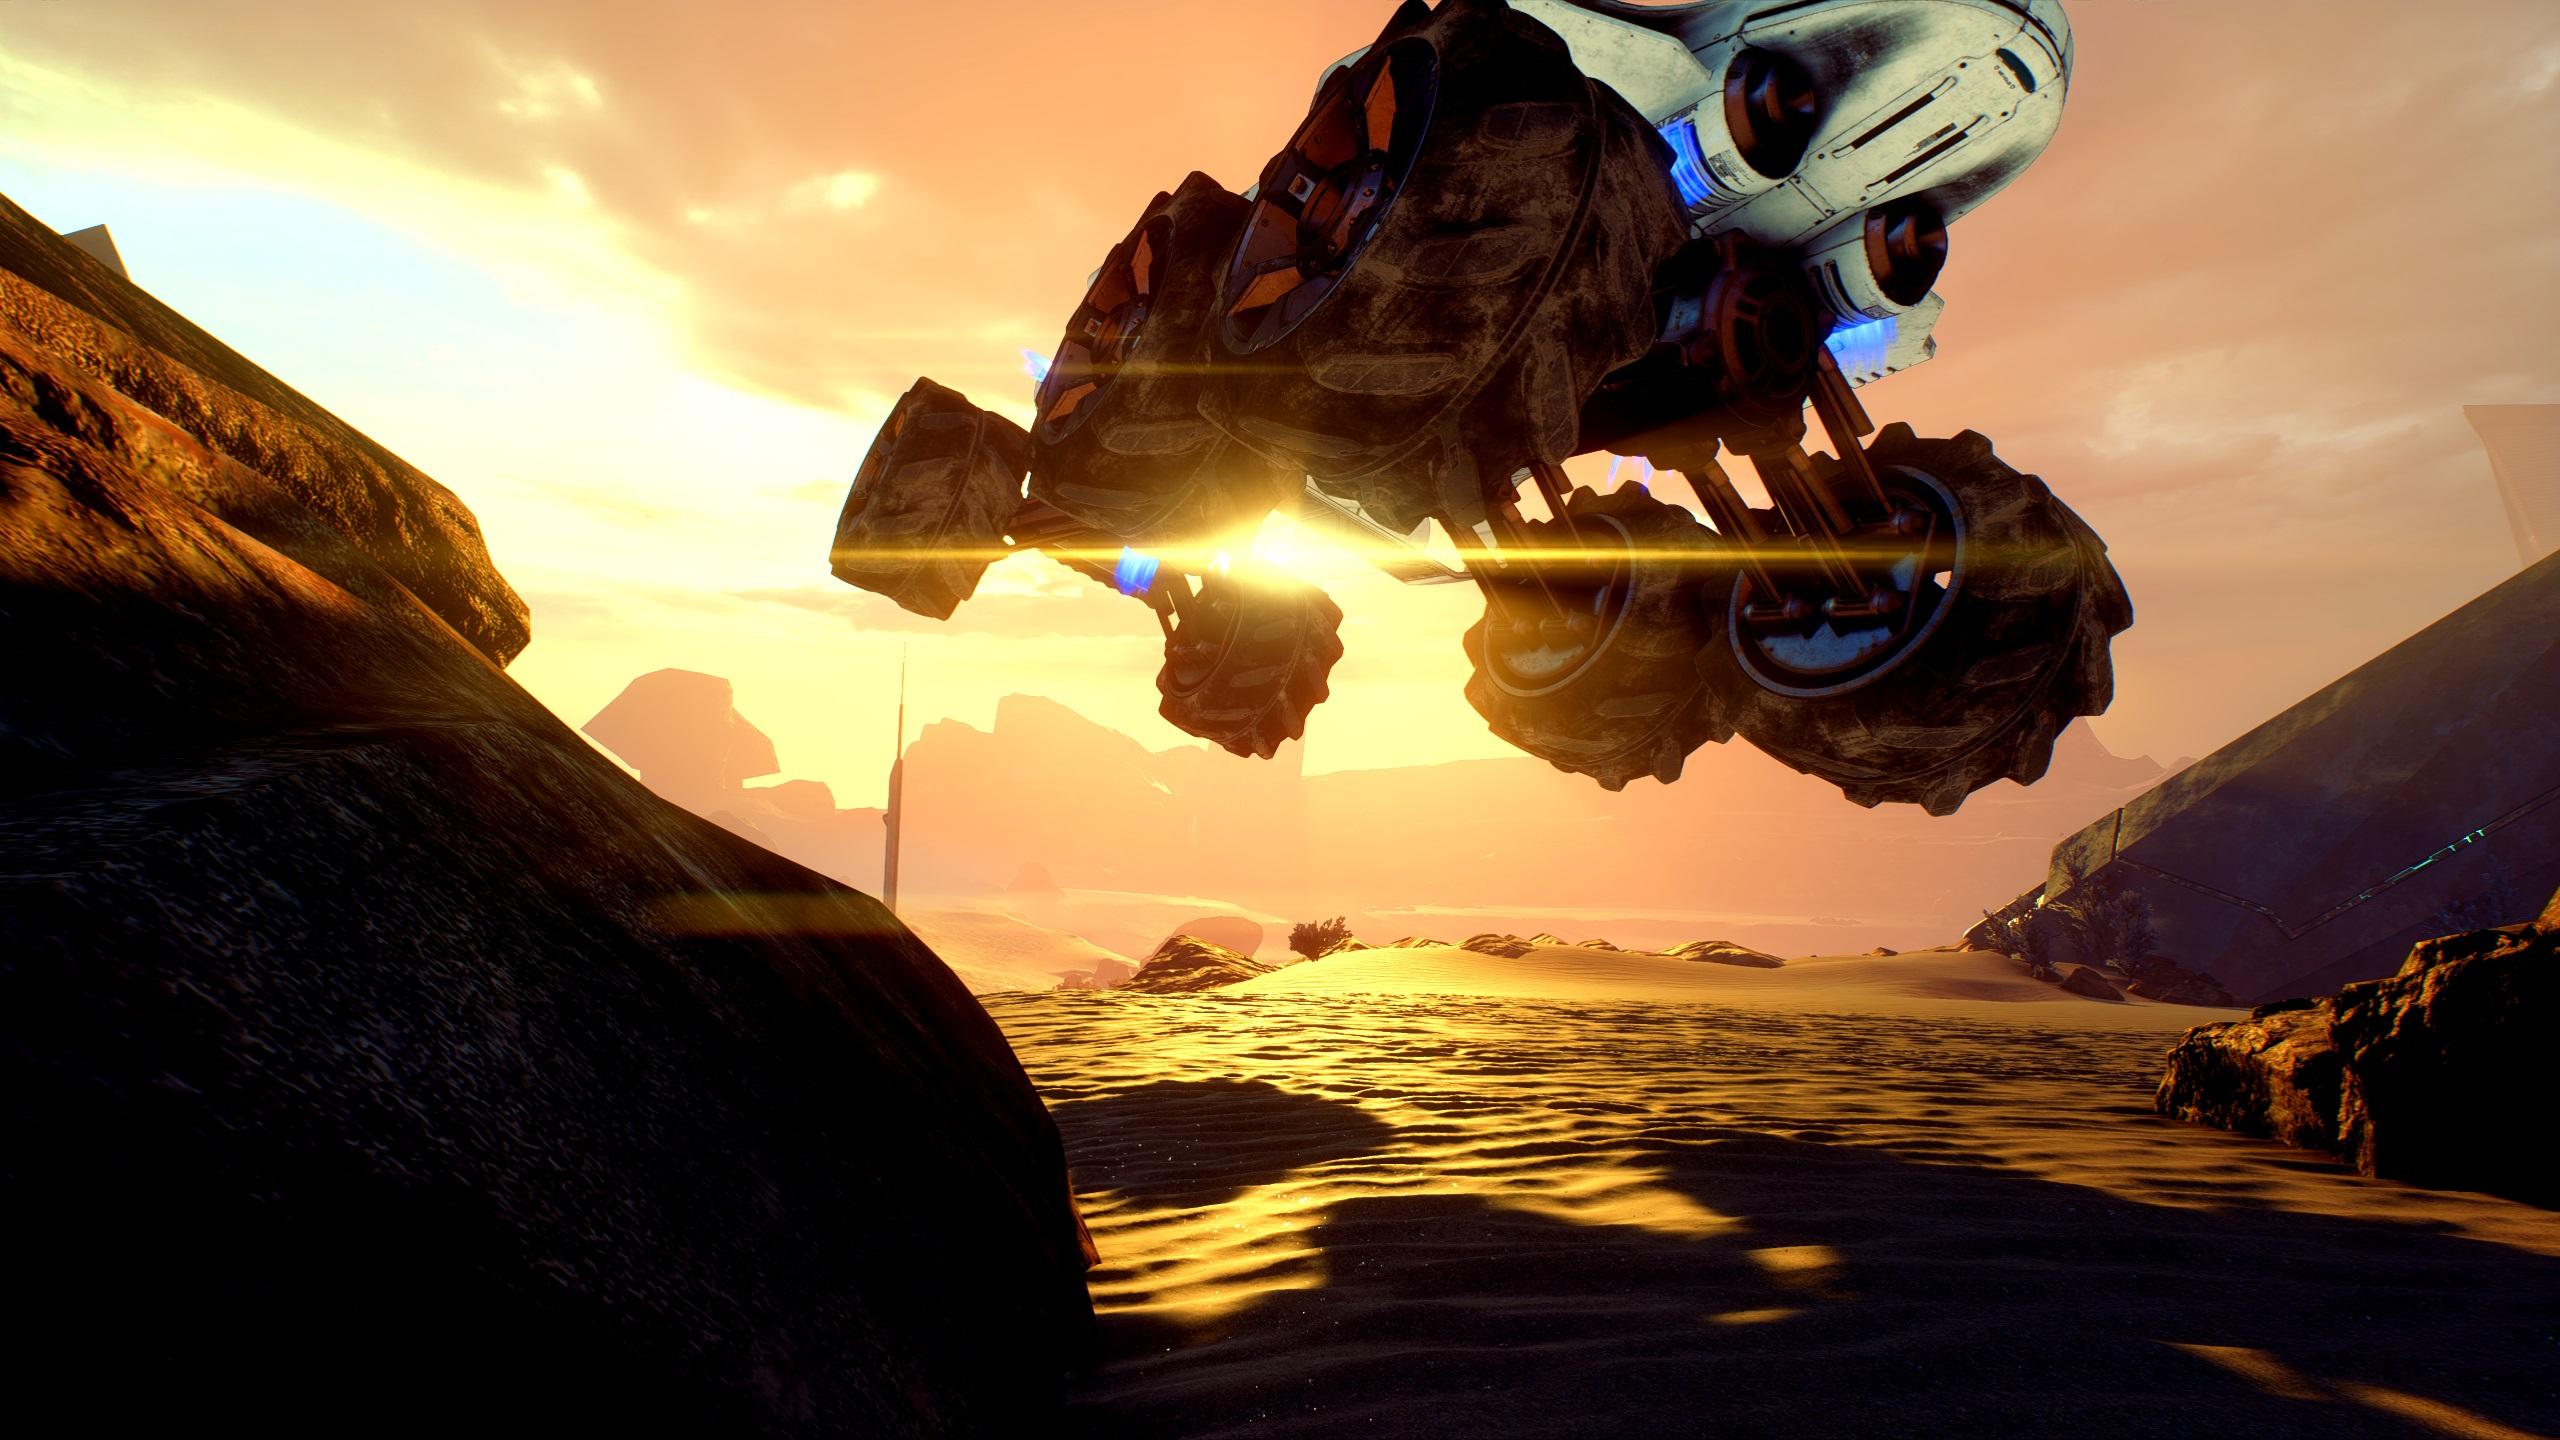 Nvidia Ansel - a screenshot of the future? - INN